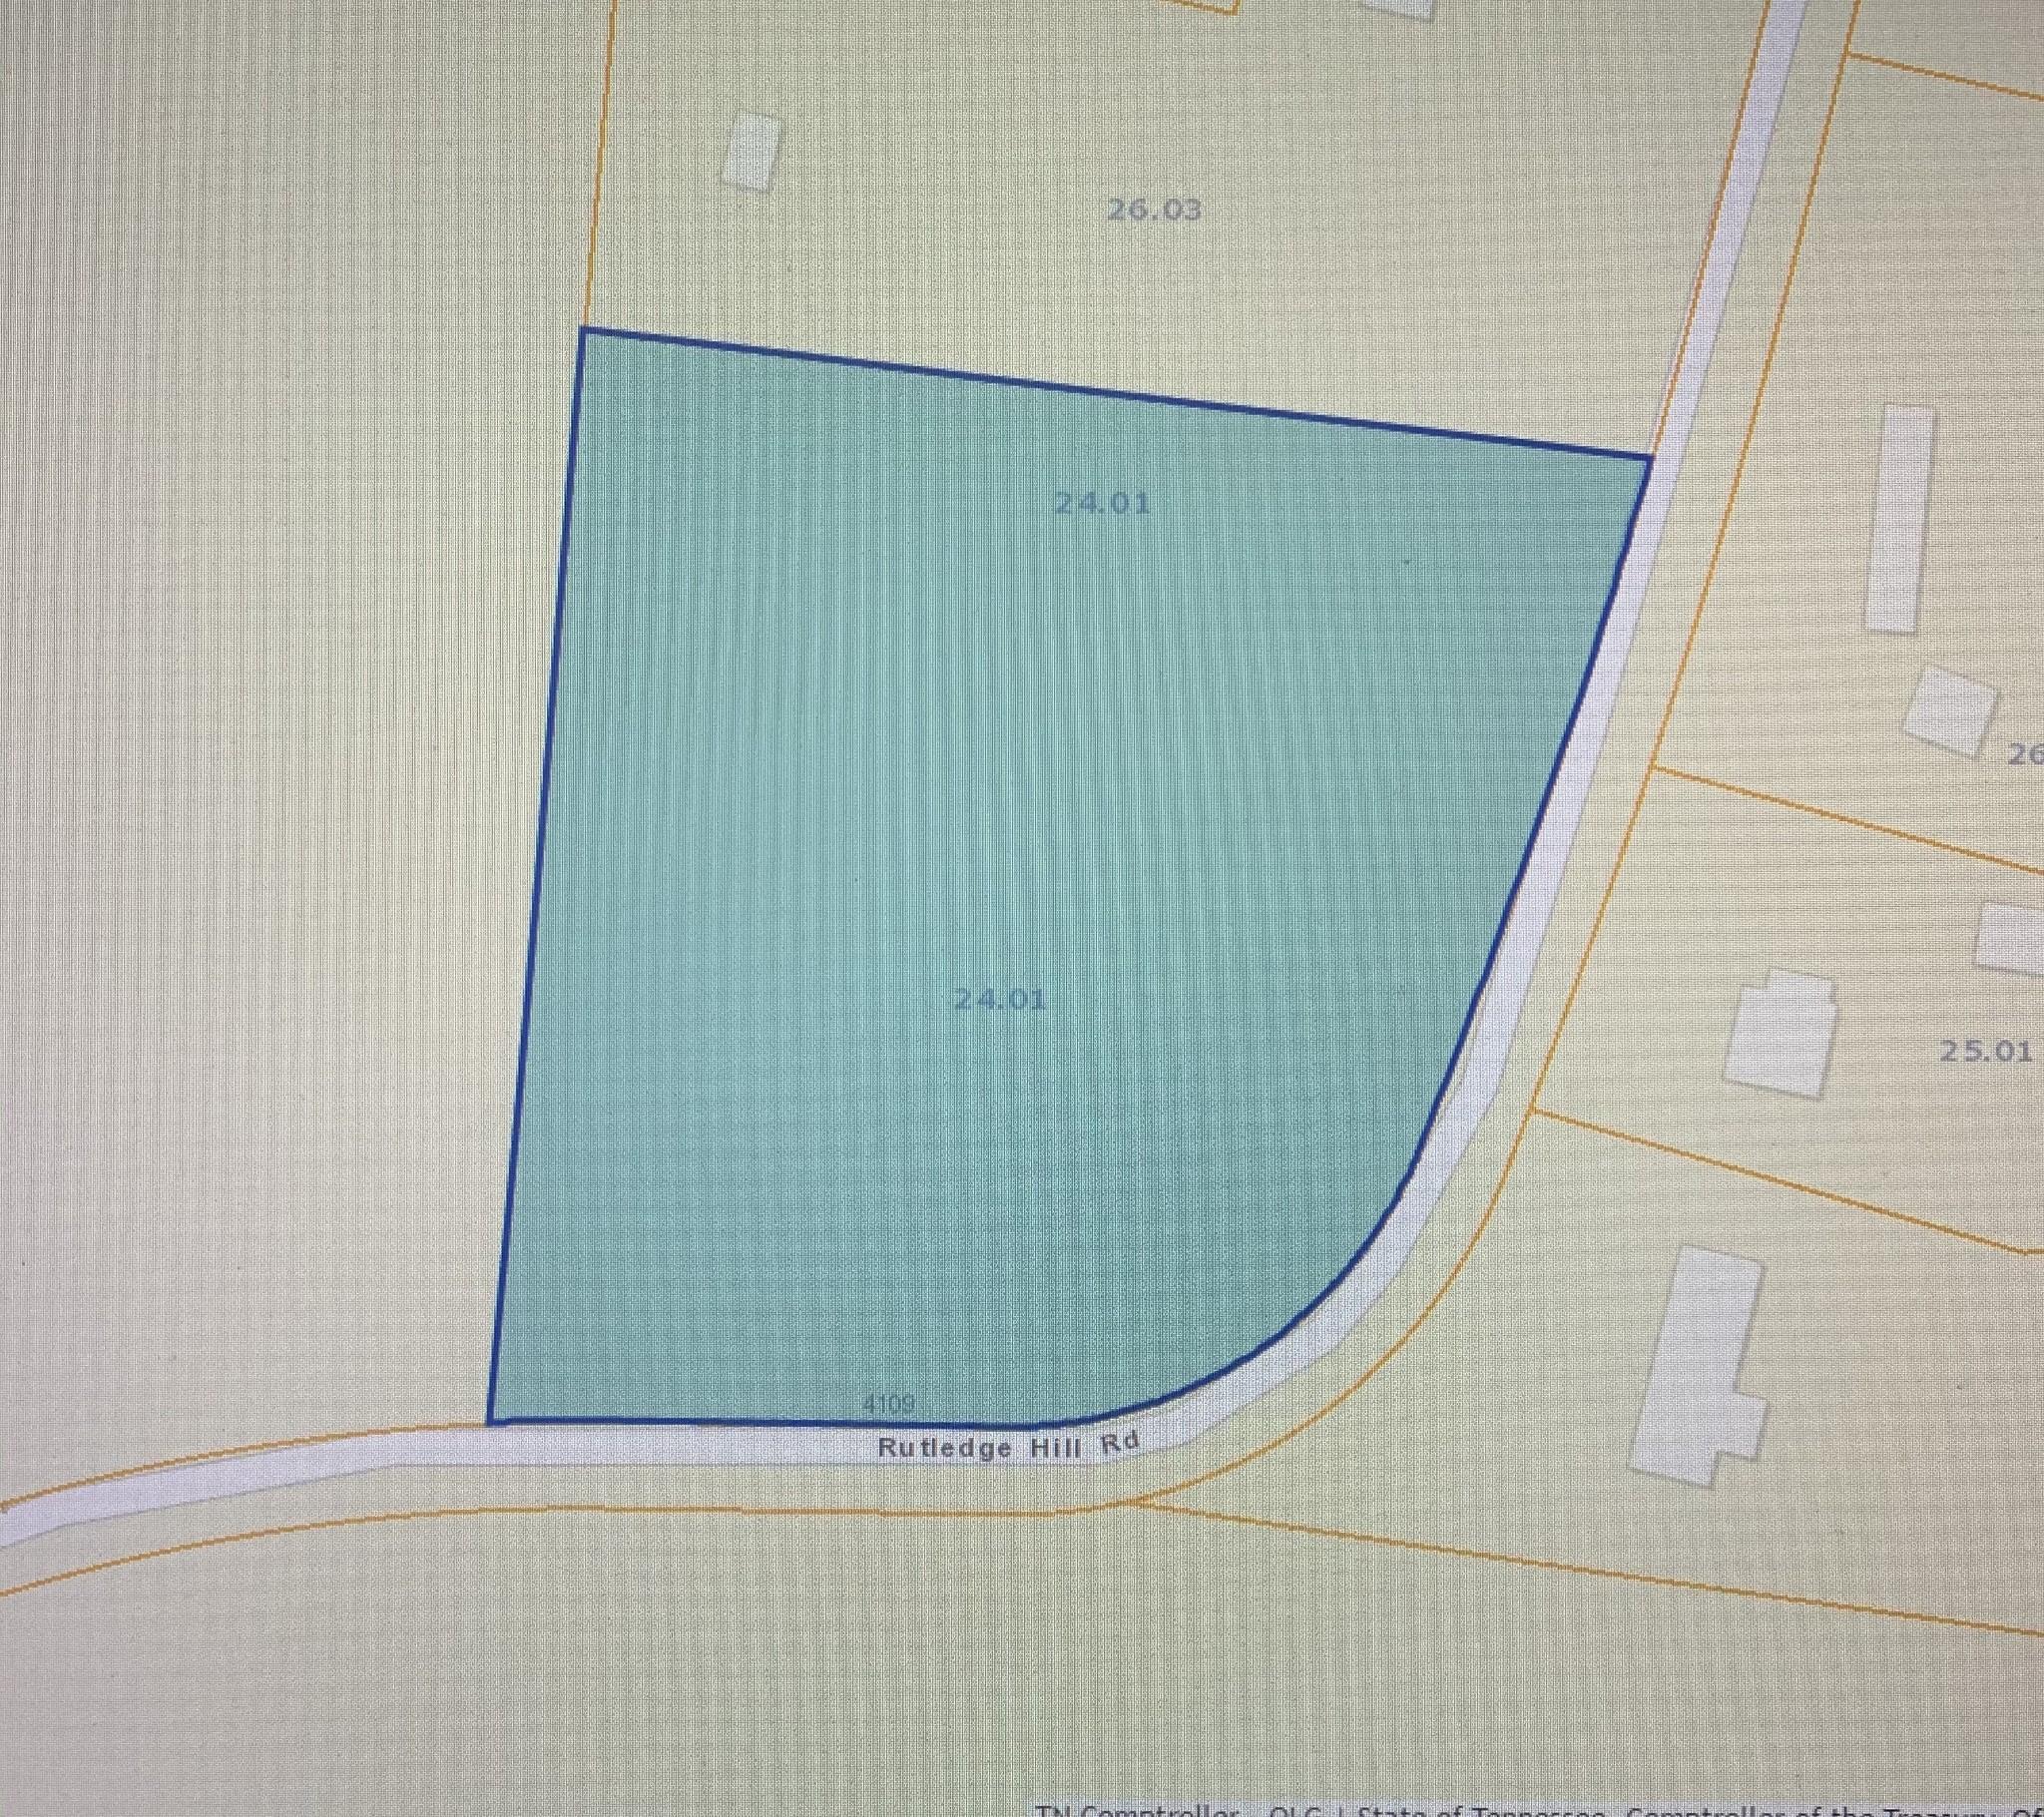 0 Rutledge Hill Rd Property Photo - Hillsboro, TN real estate listing